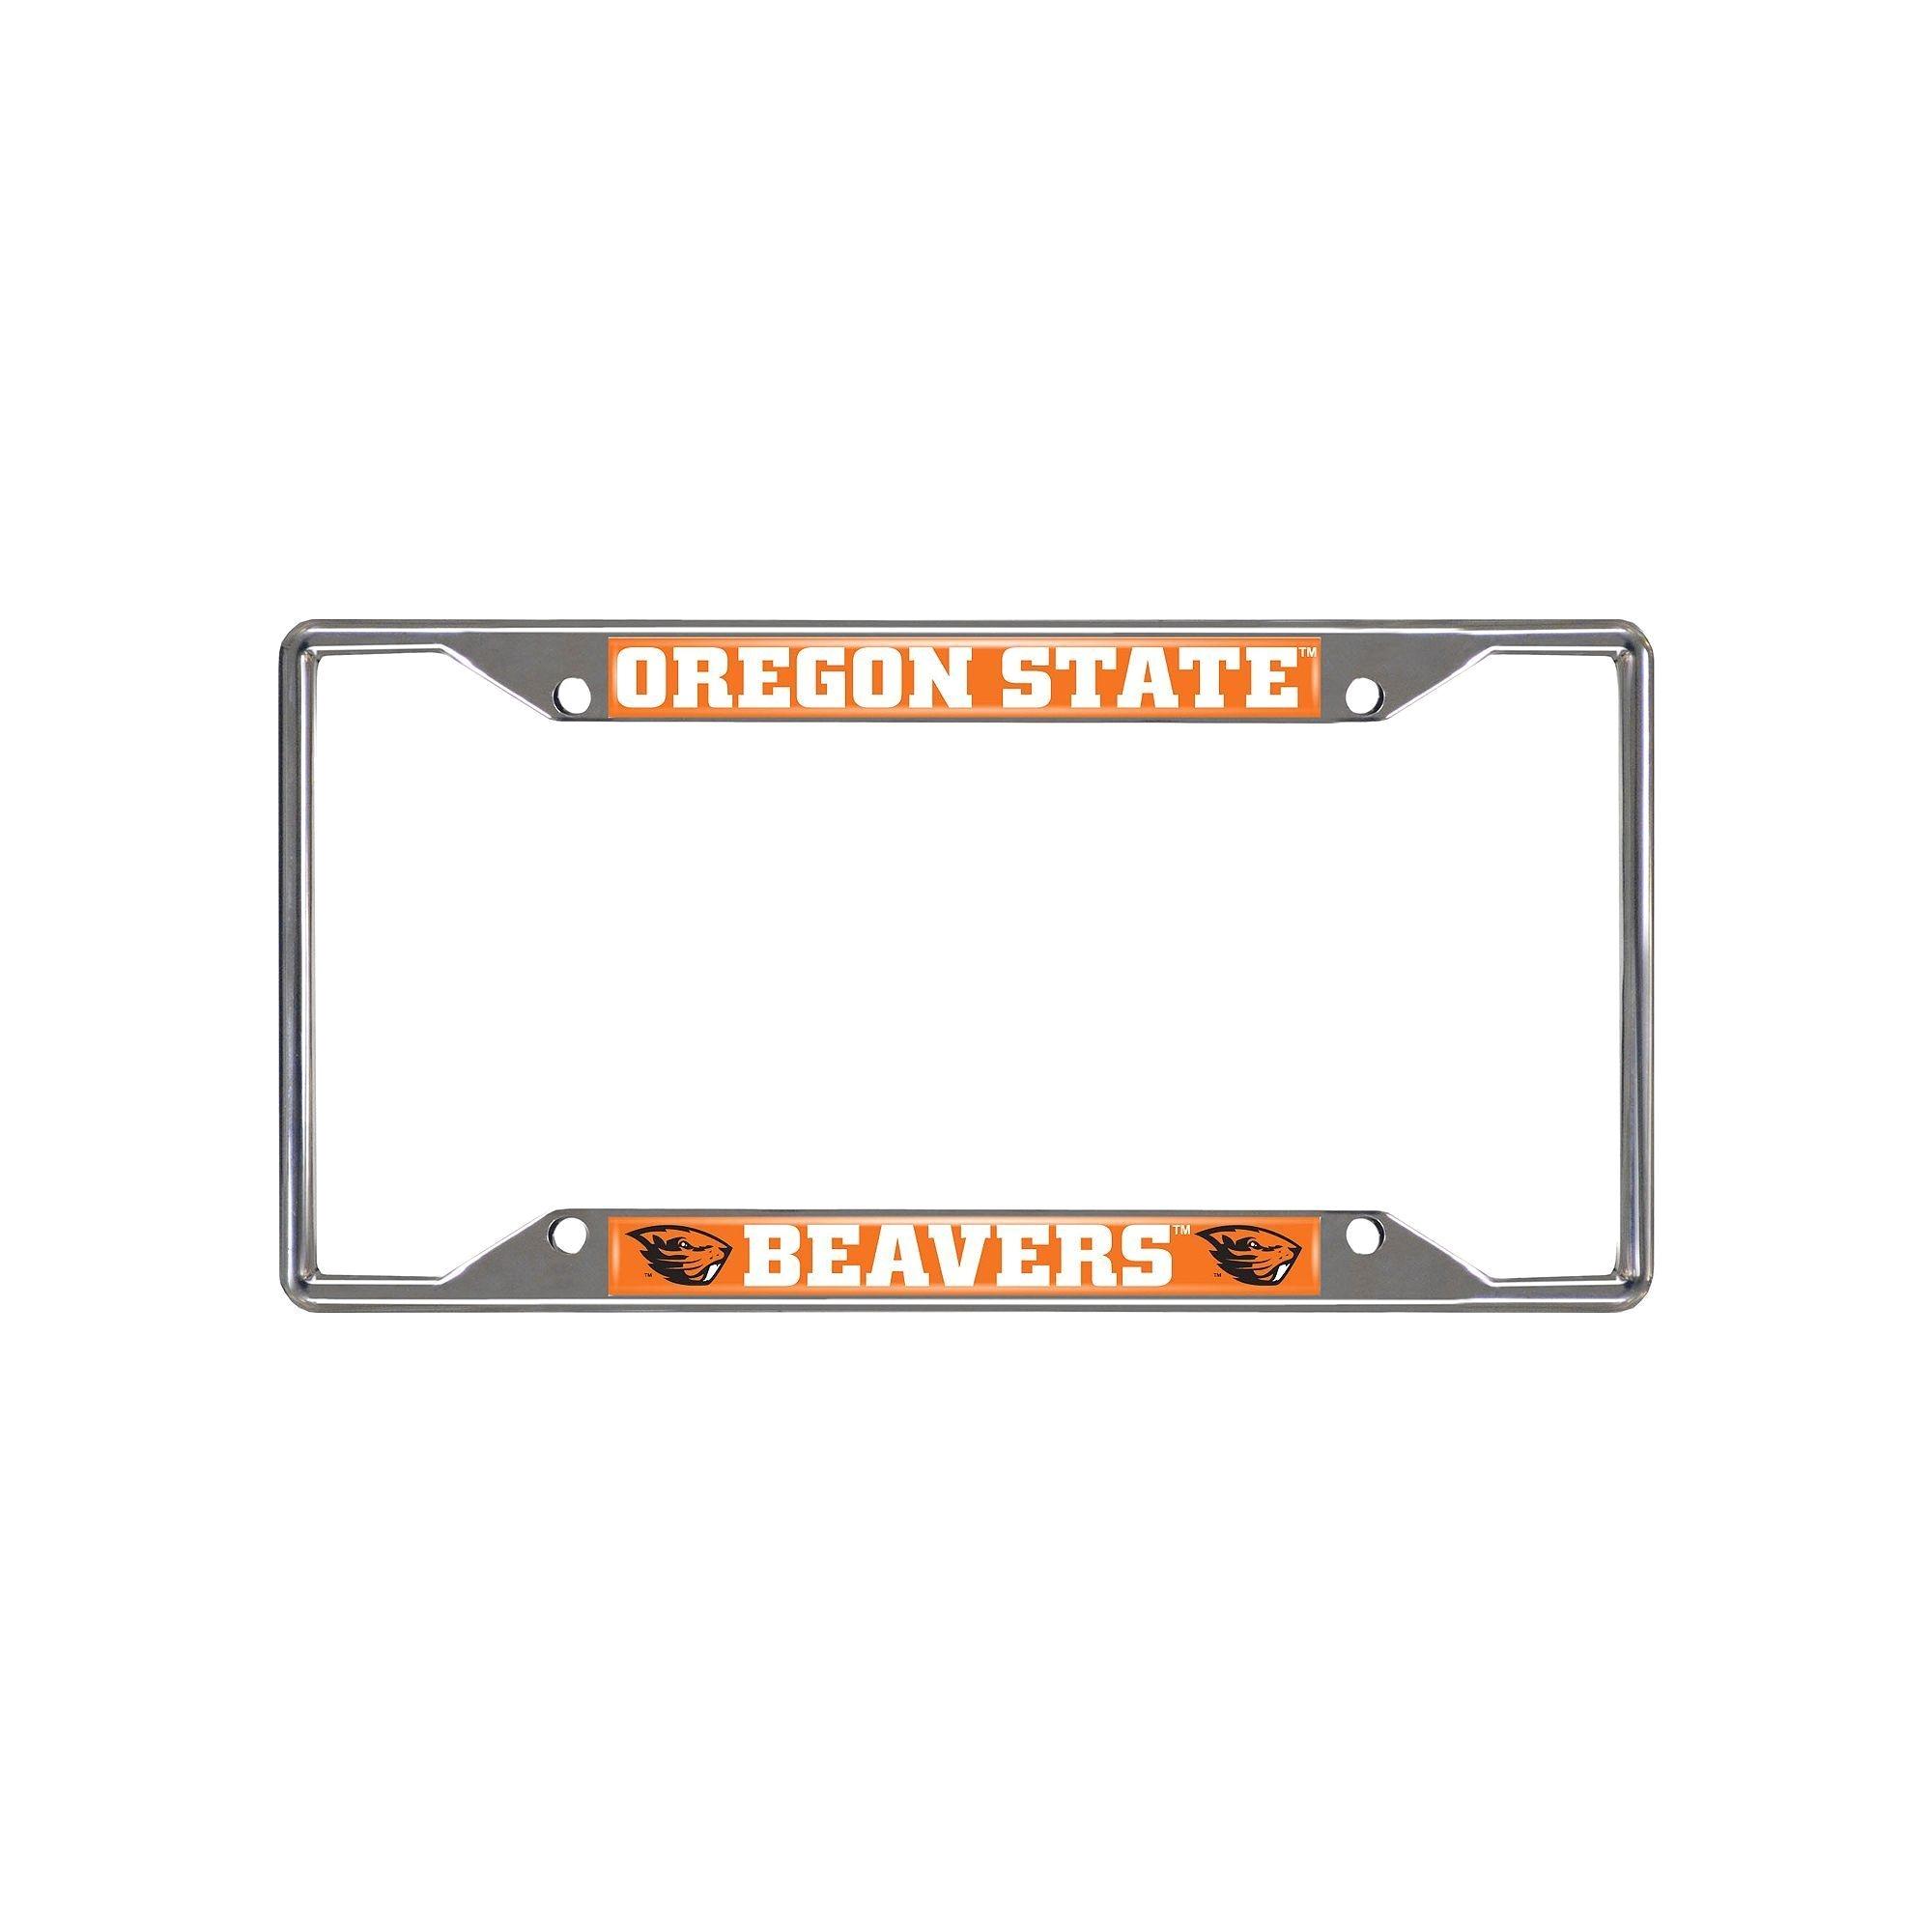 Decorative Chrome License Plate Frames Kohl S oregon State Beavers License Plate Frame License Plate